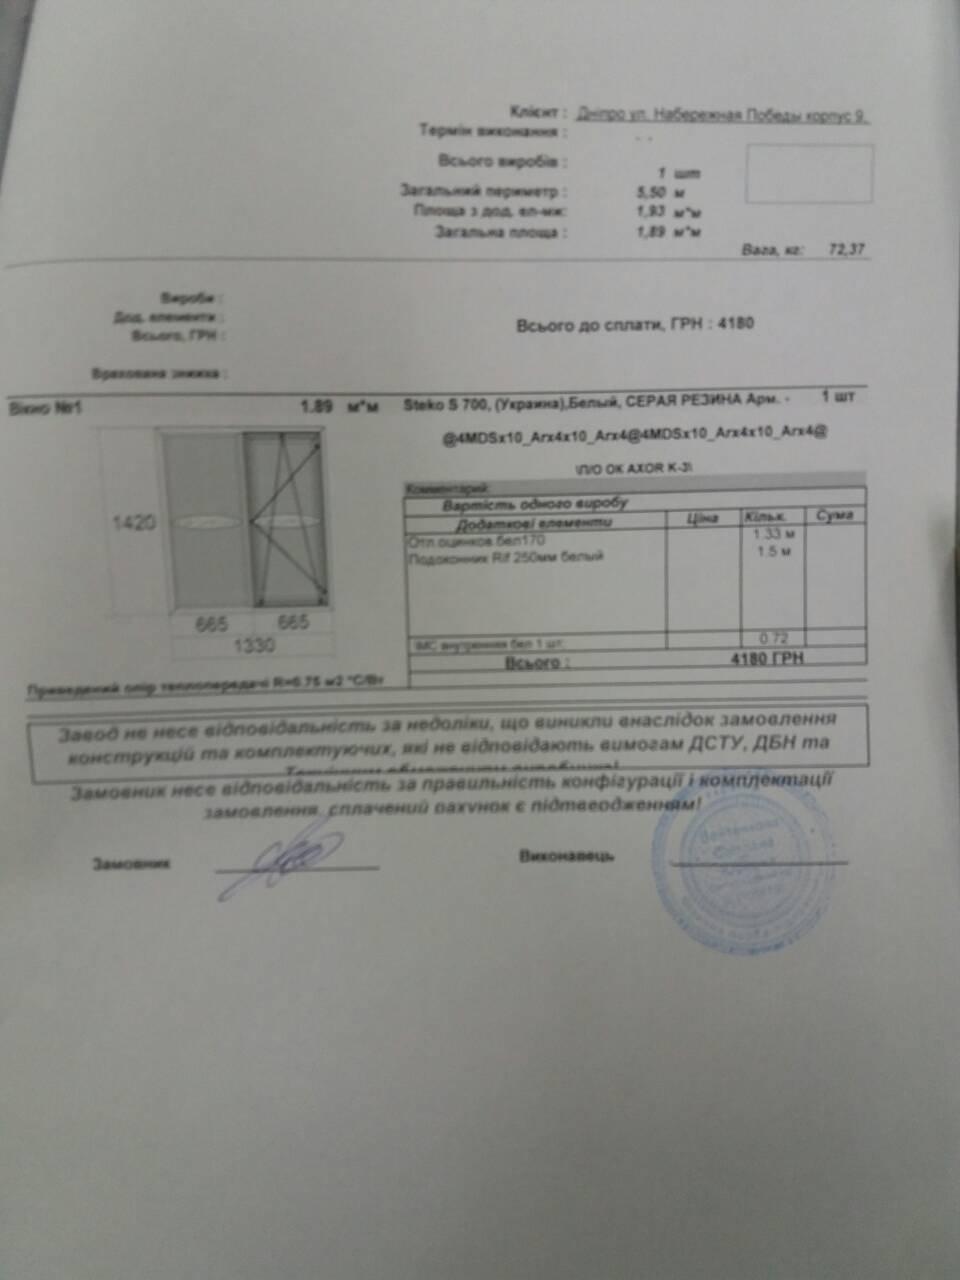 Компания «Алиас» - Ответ компании Алиас на отзыв Олега Леонидовича